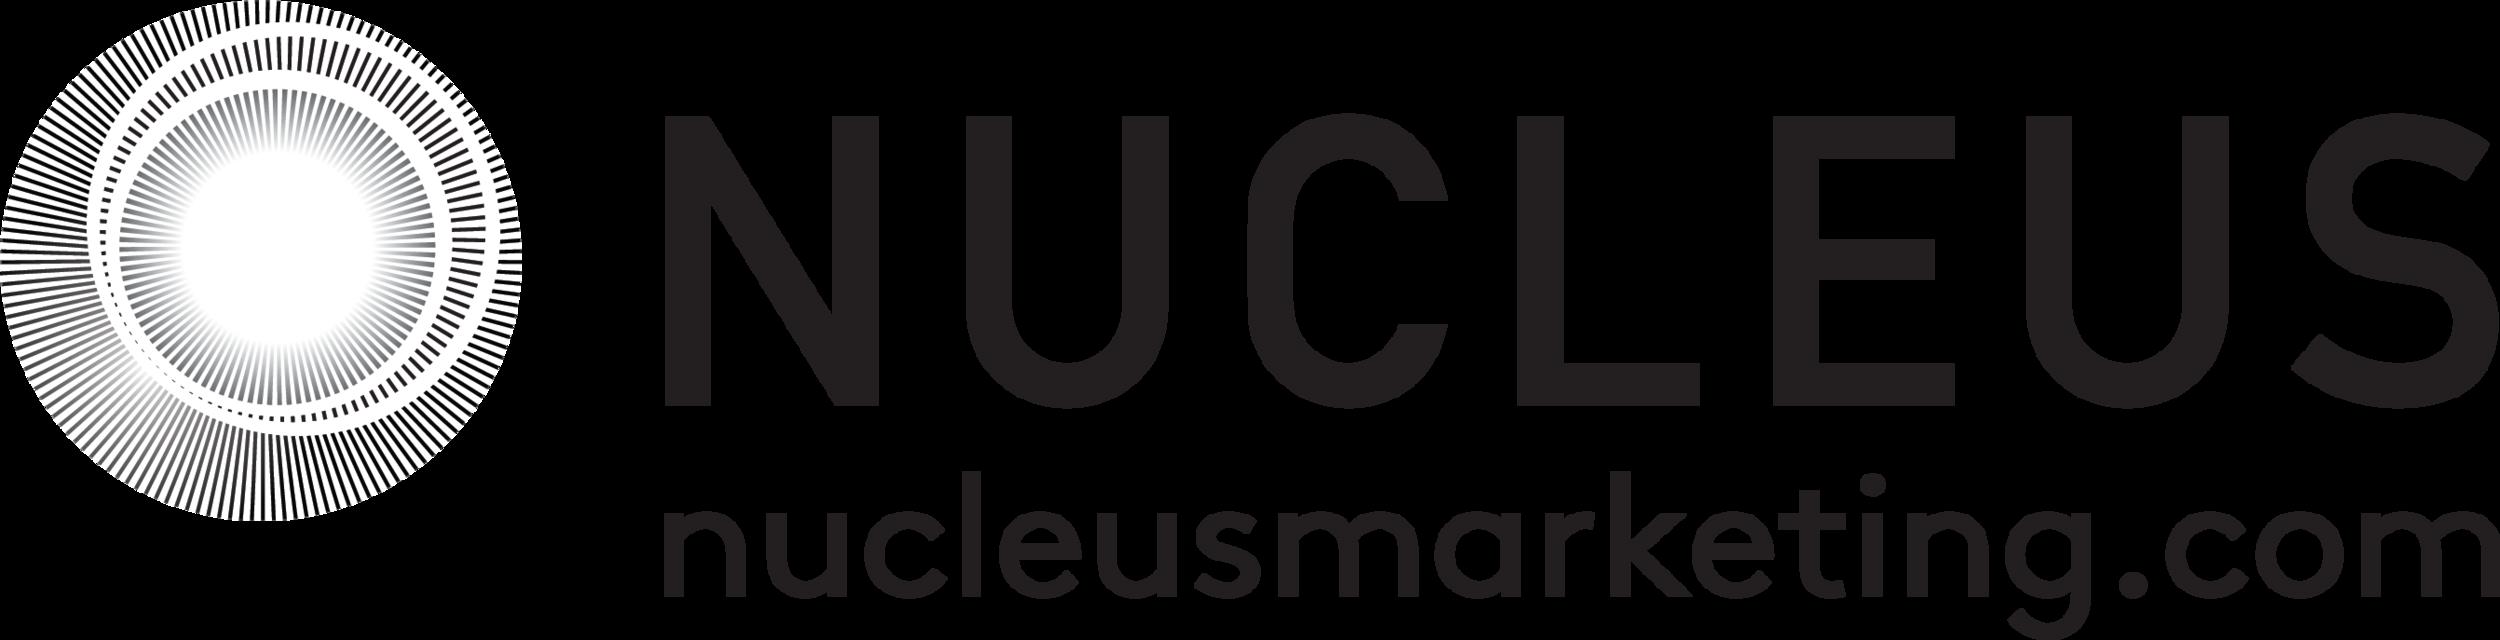 Nucleus-LogoLockup-Black.png